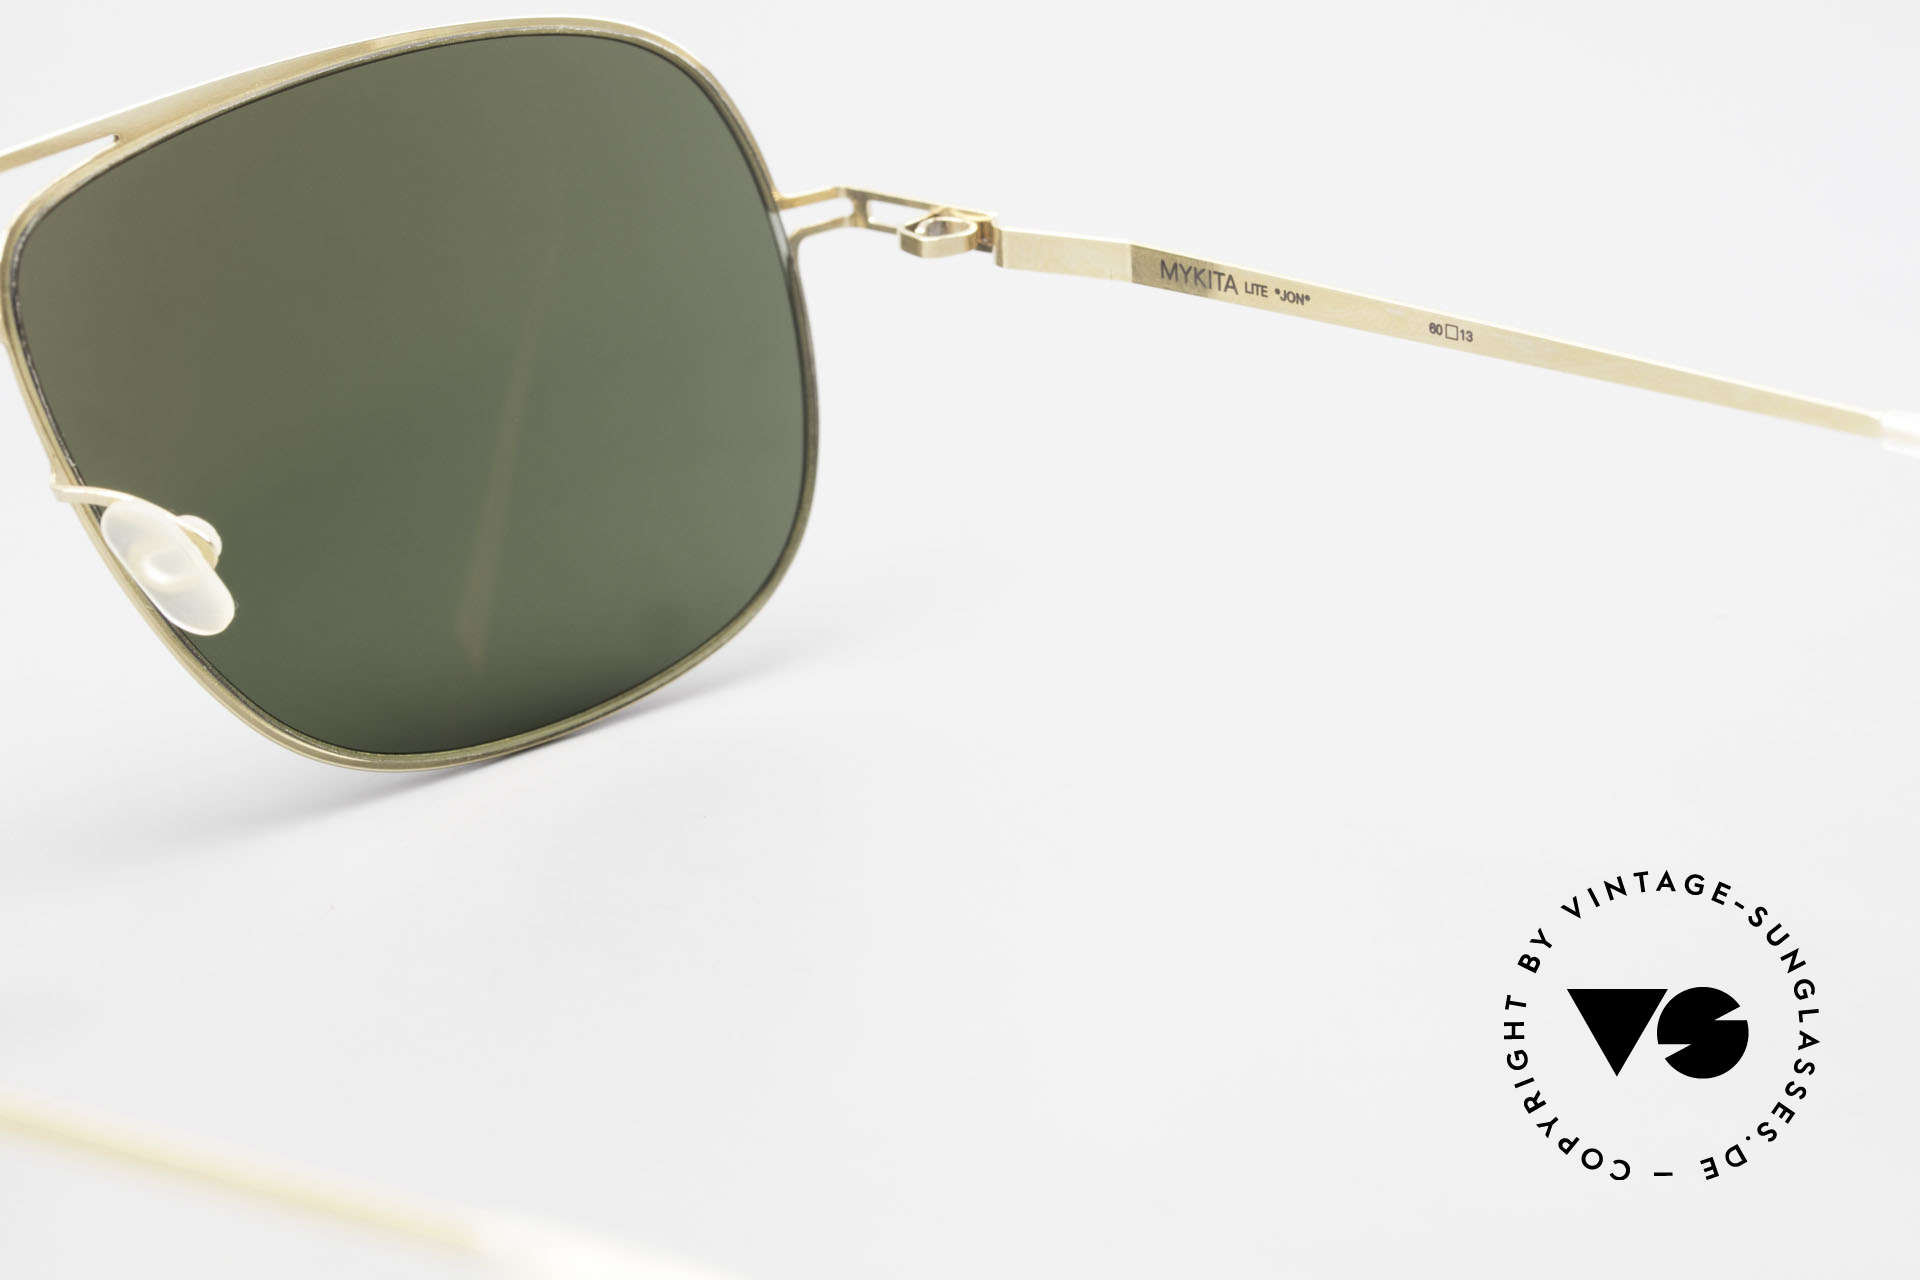 Mykita Jon Designer Lite Metal Sunglasses, Mod. Jon = similar to Mod. Rolf (worn by Jolie & Pitt), Made for Men and Women